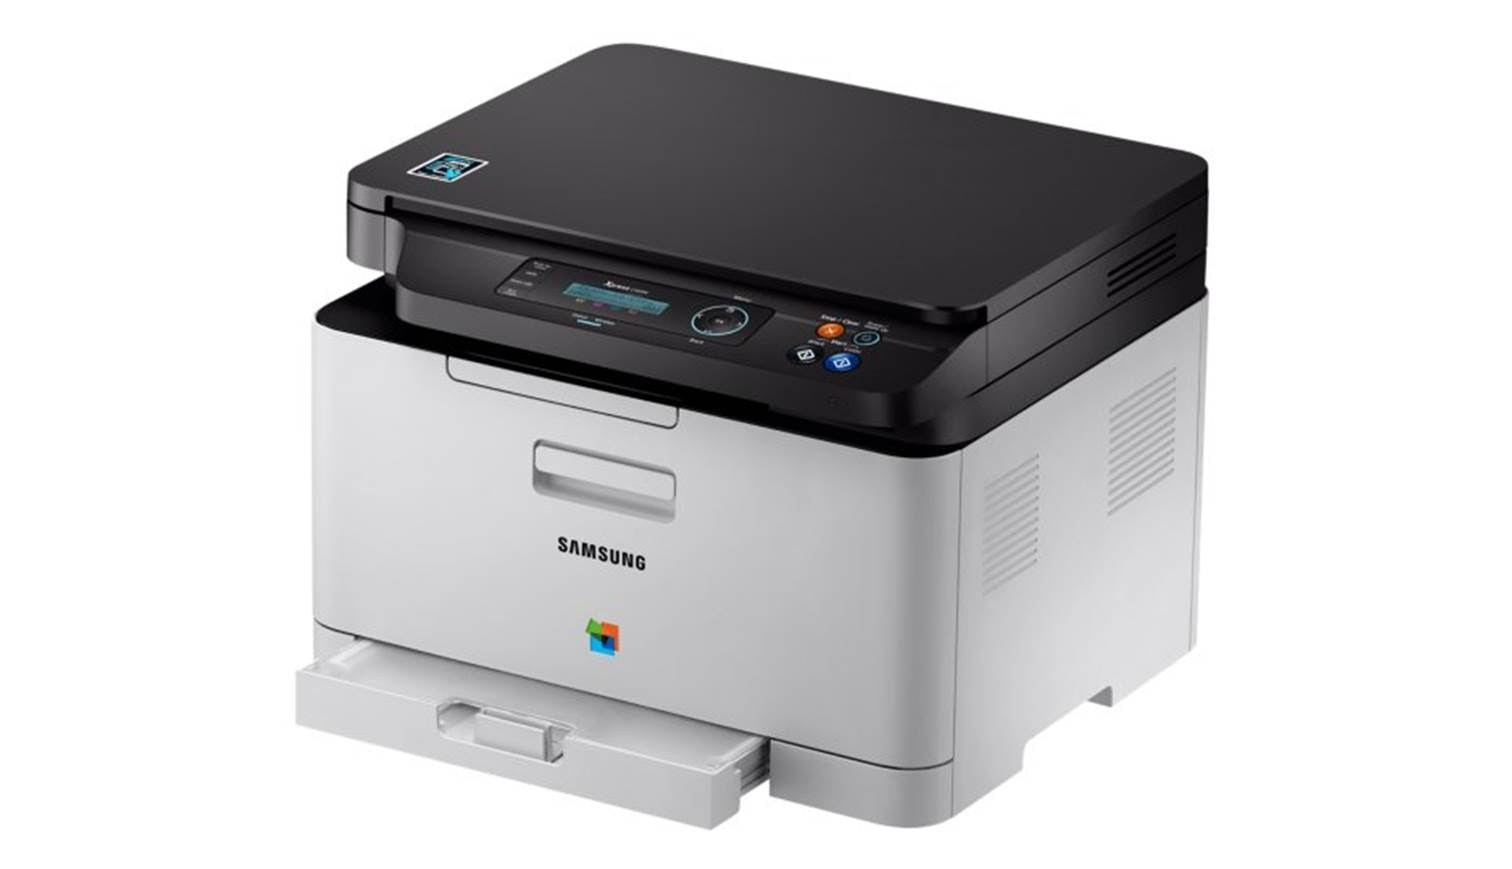 Samsung Printer Drivers Auto Detect